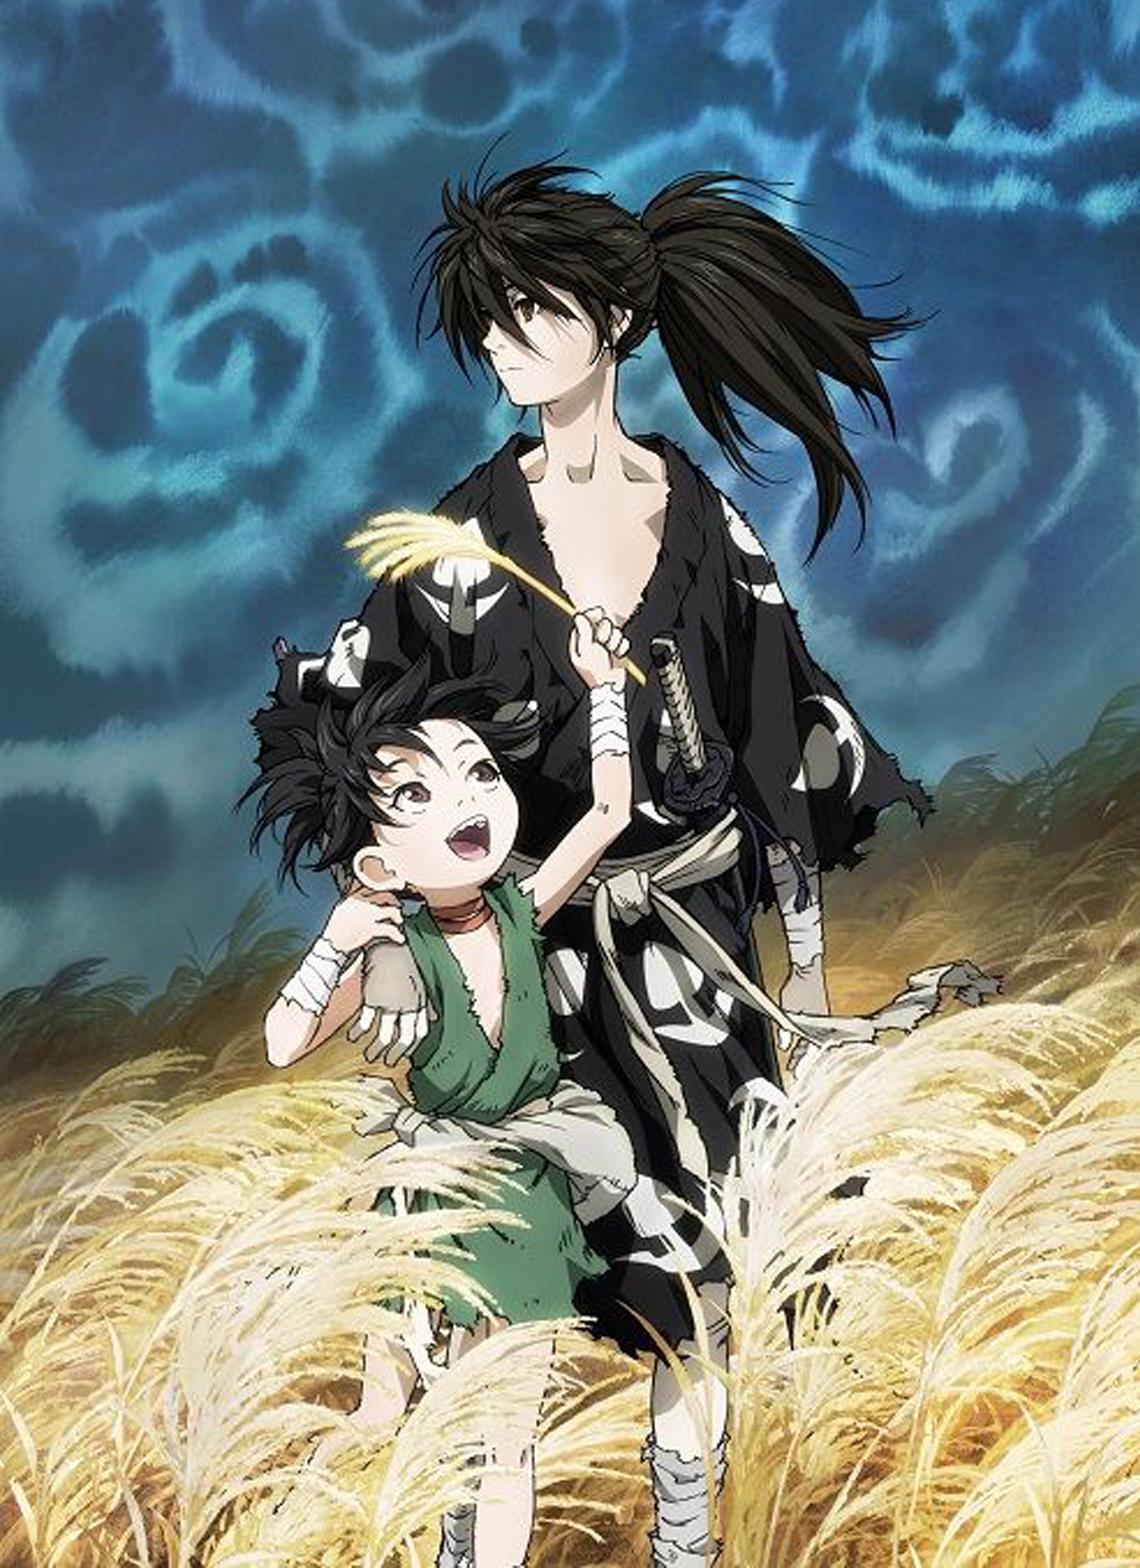 Pin de Ali em Dororo imagens) Anime, Anime kawaii